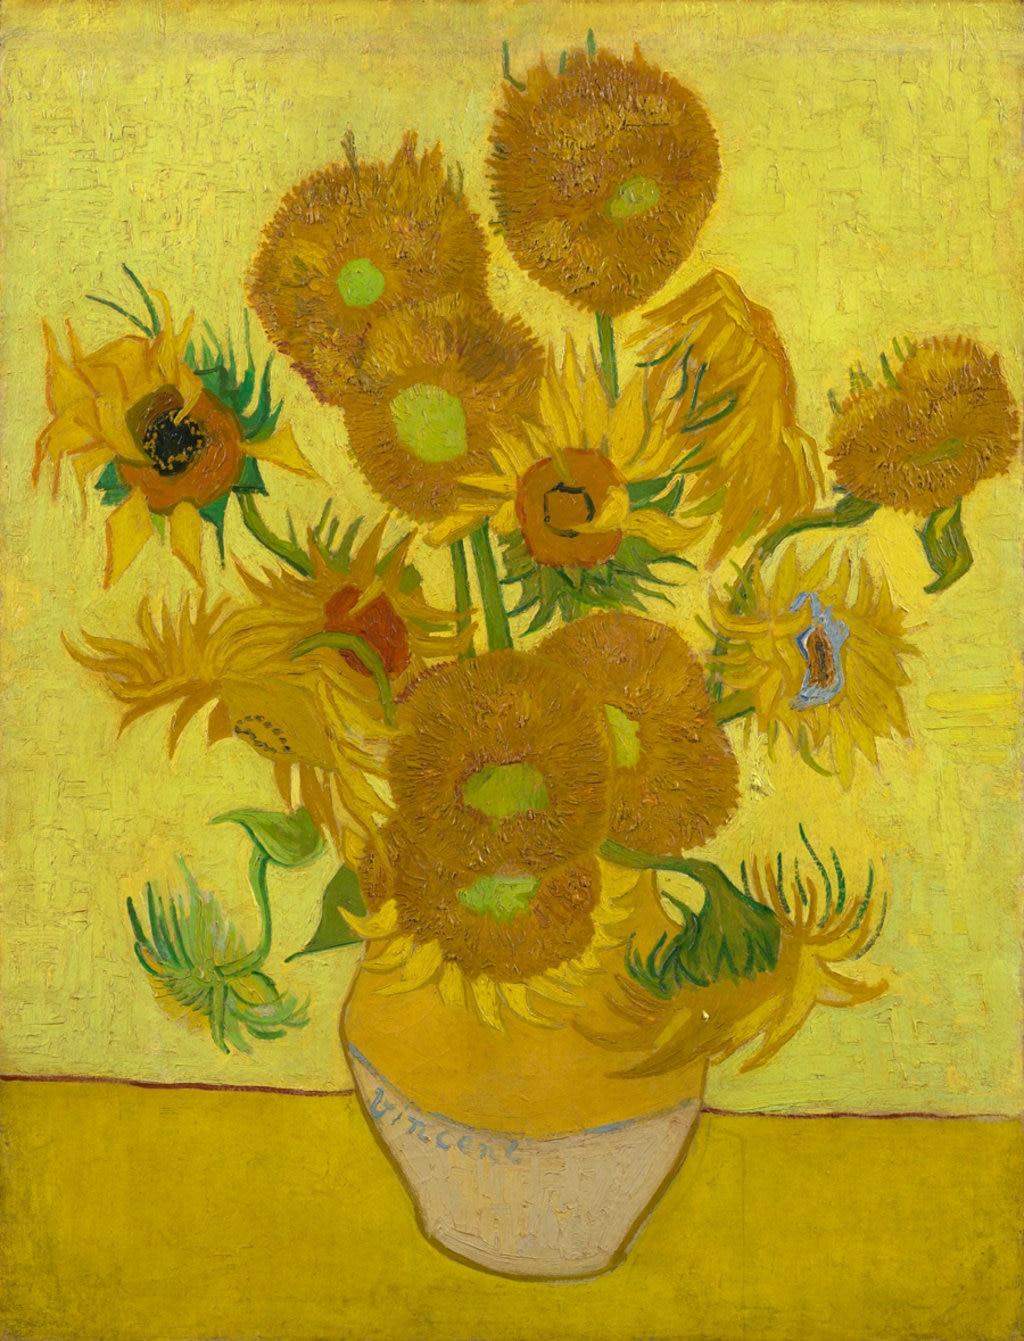 Vincent van Gogh, Girasoli, 1889. Courtesy of the Van Gogh Museum, Amsterdam